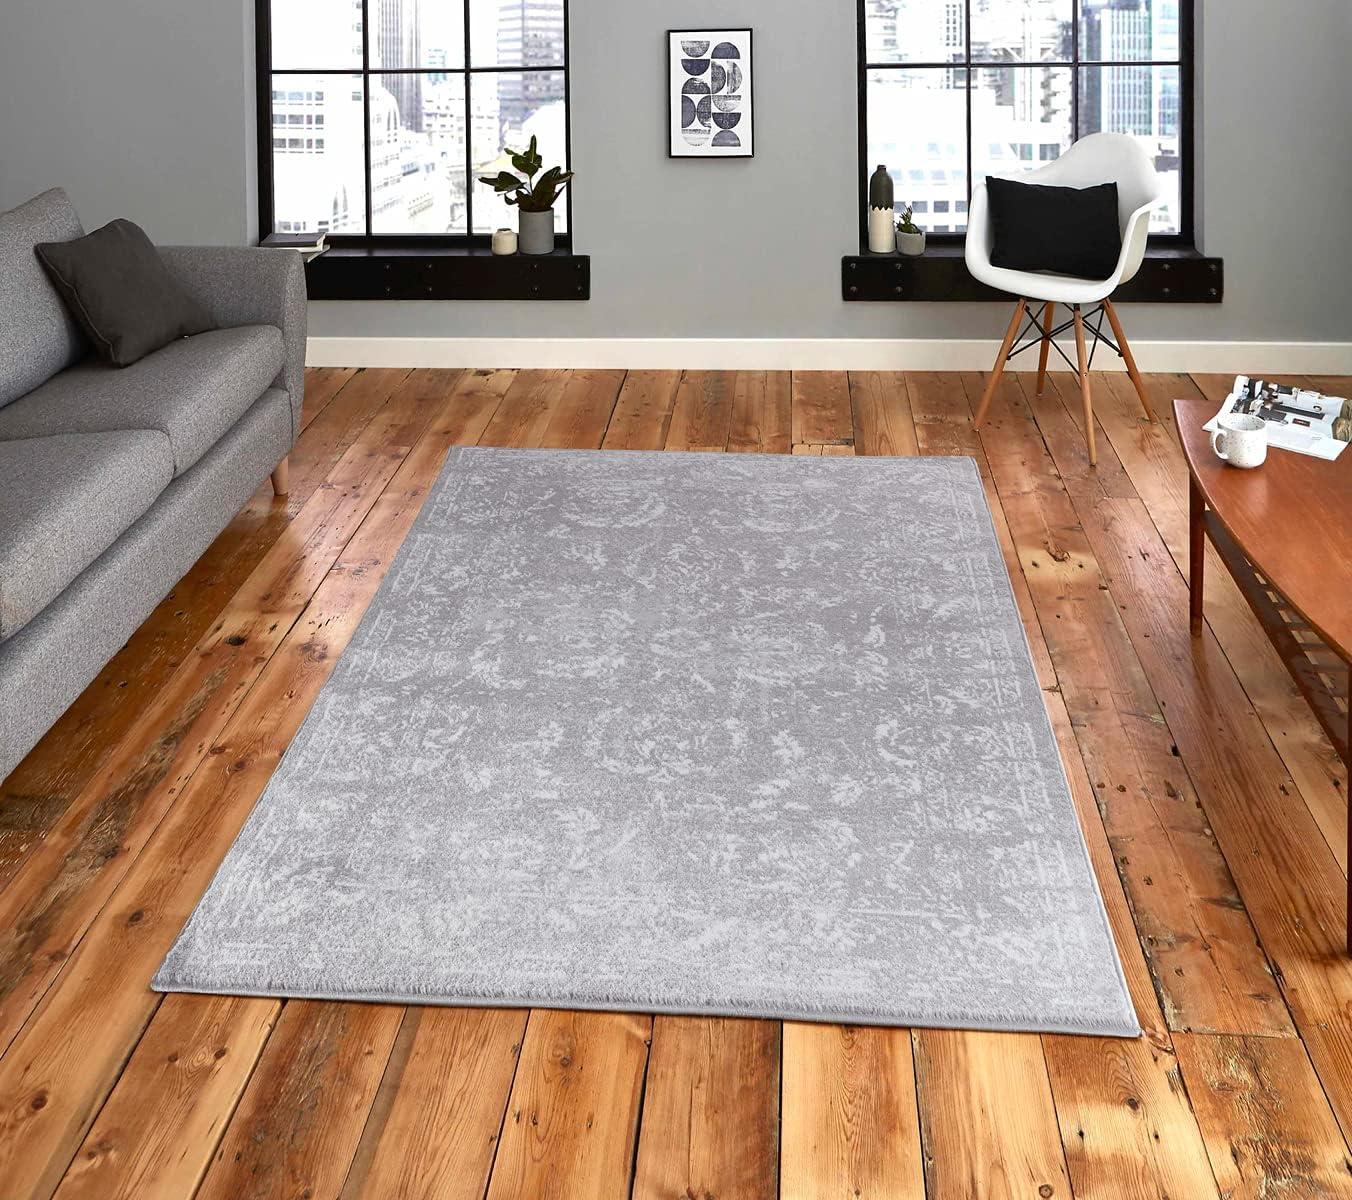 The Sofia Rugs Atlantis 8x10 Area Decor List price Home Gray Rug Sale special price Modern